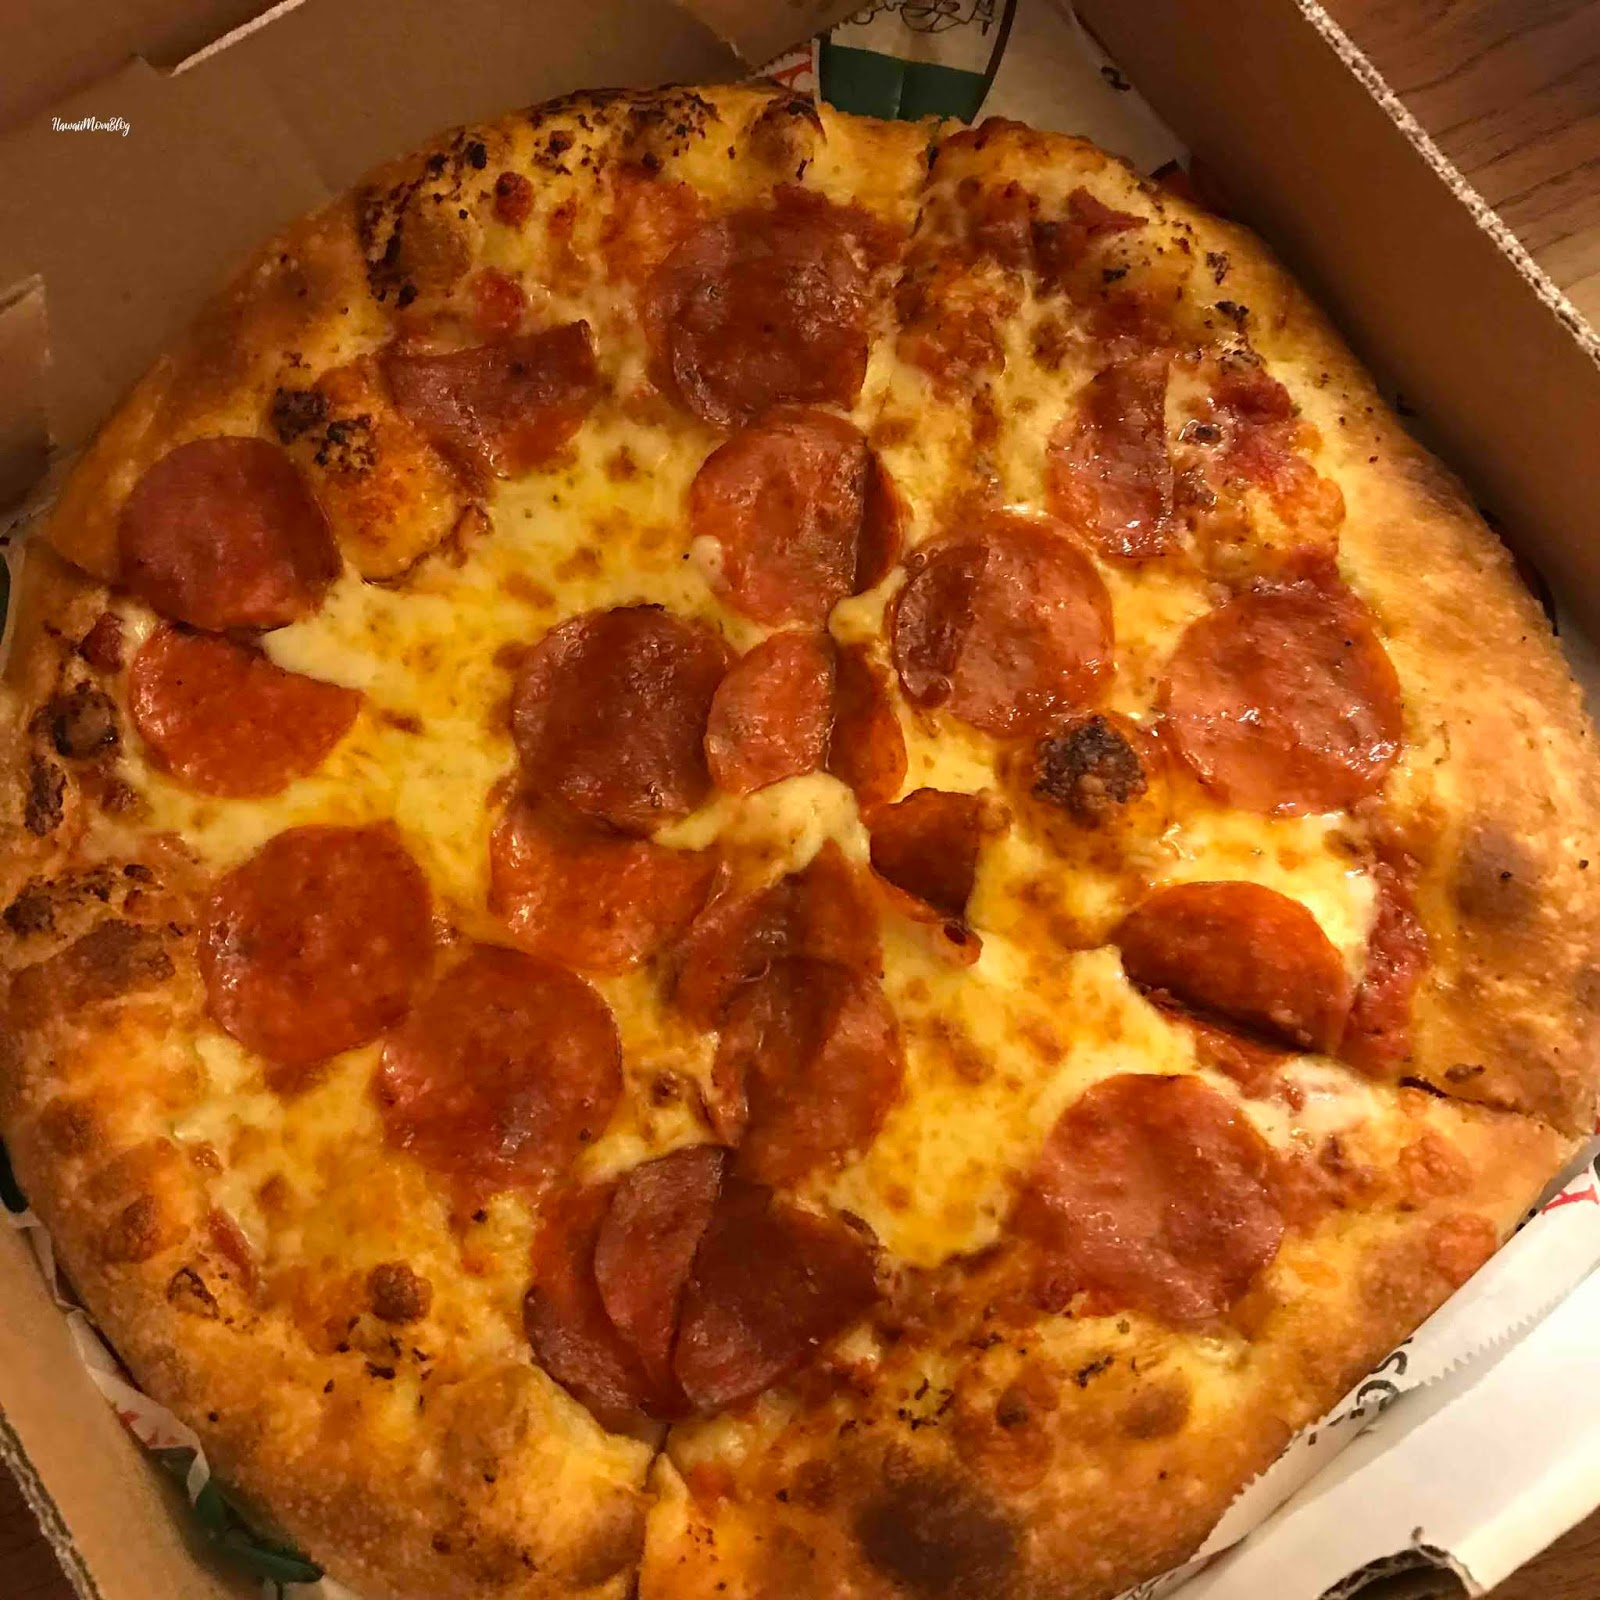 Best Pizza In Virginia Beach Va: Hawaii Mom Blog: Visit Virginia: Paisano's Pizza